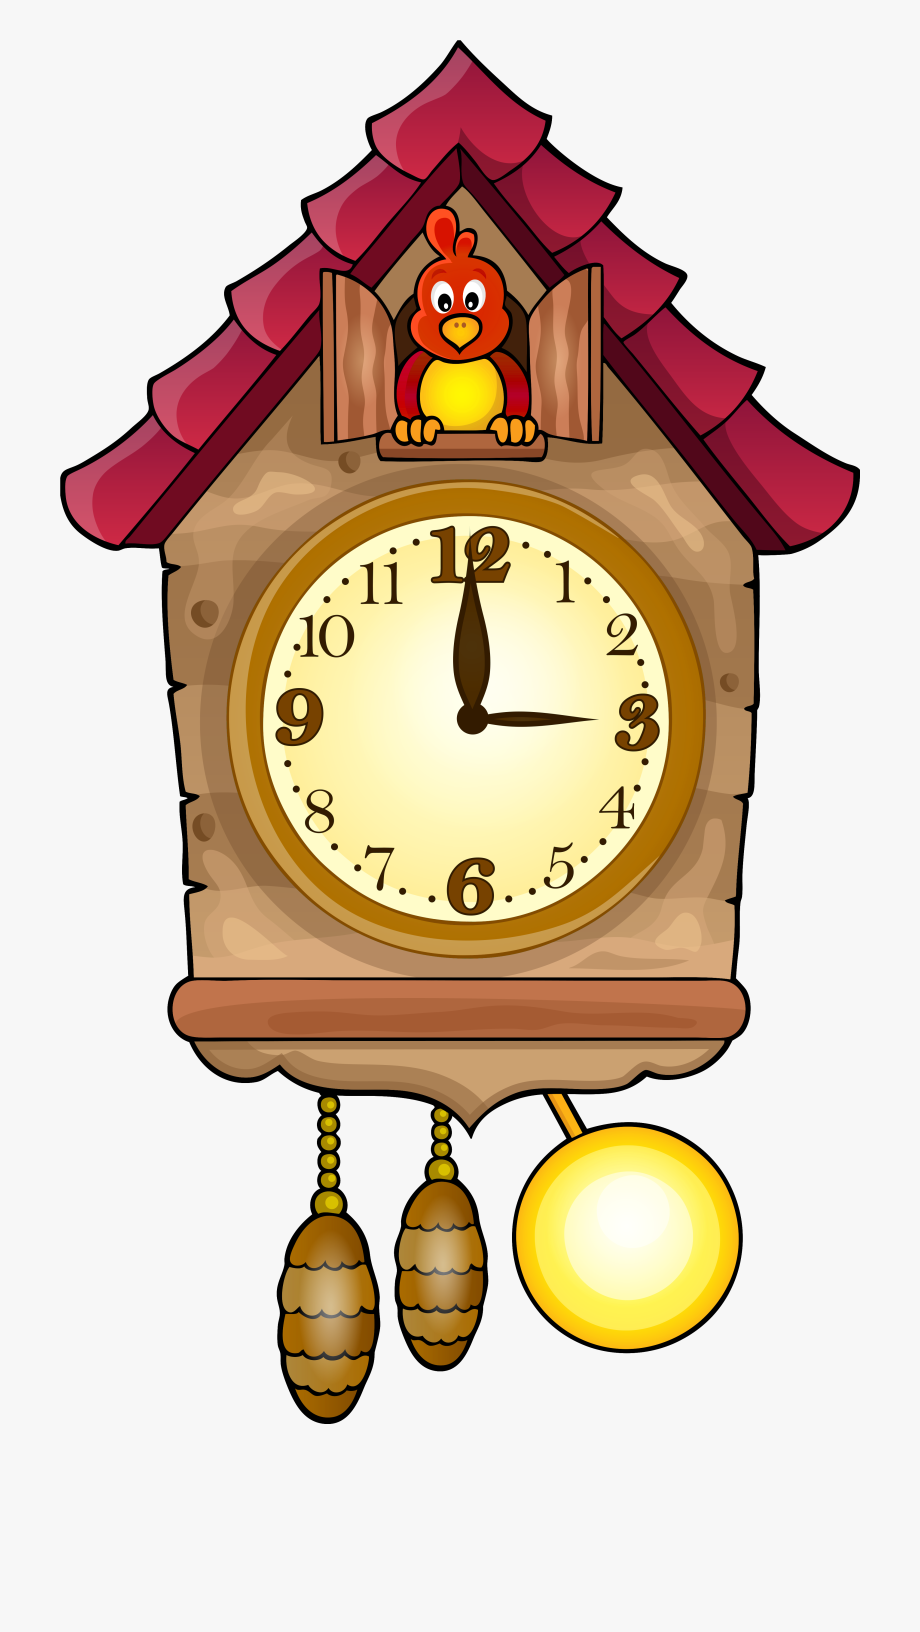 Interior at getdrawings com. Clock clipart house